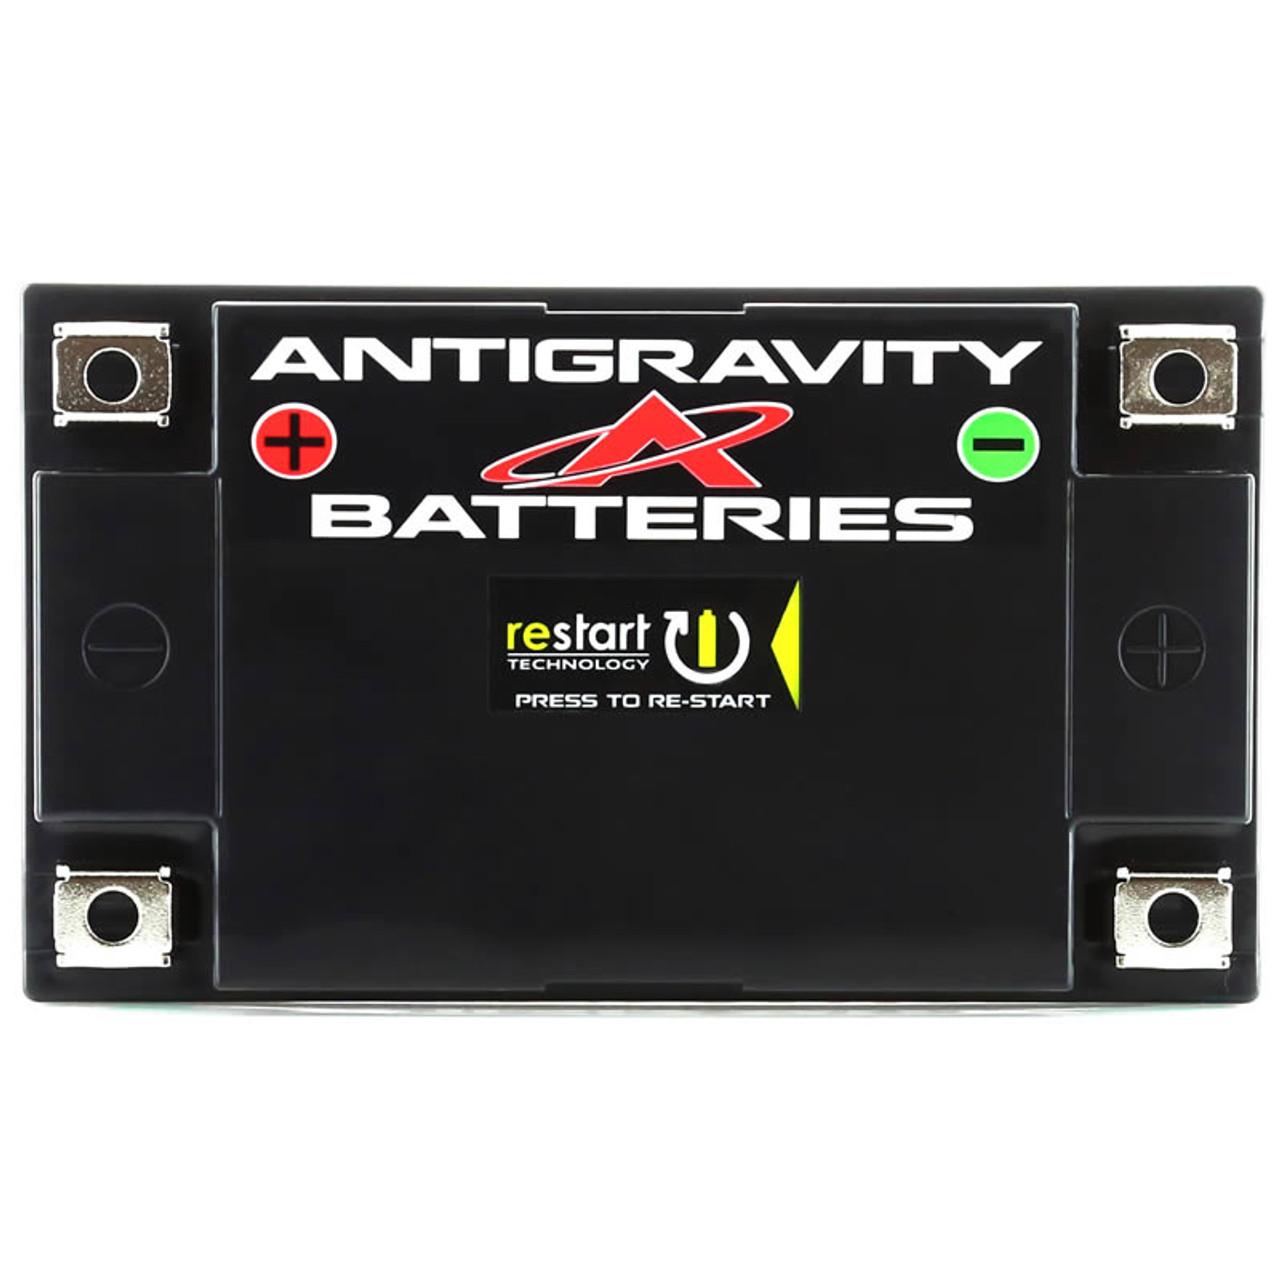 Antigravity ATX12-HD 480 RE-START Battery For Sportster